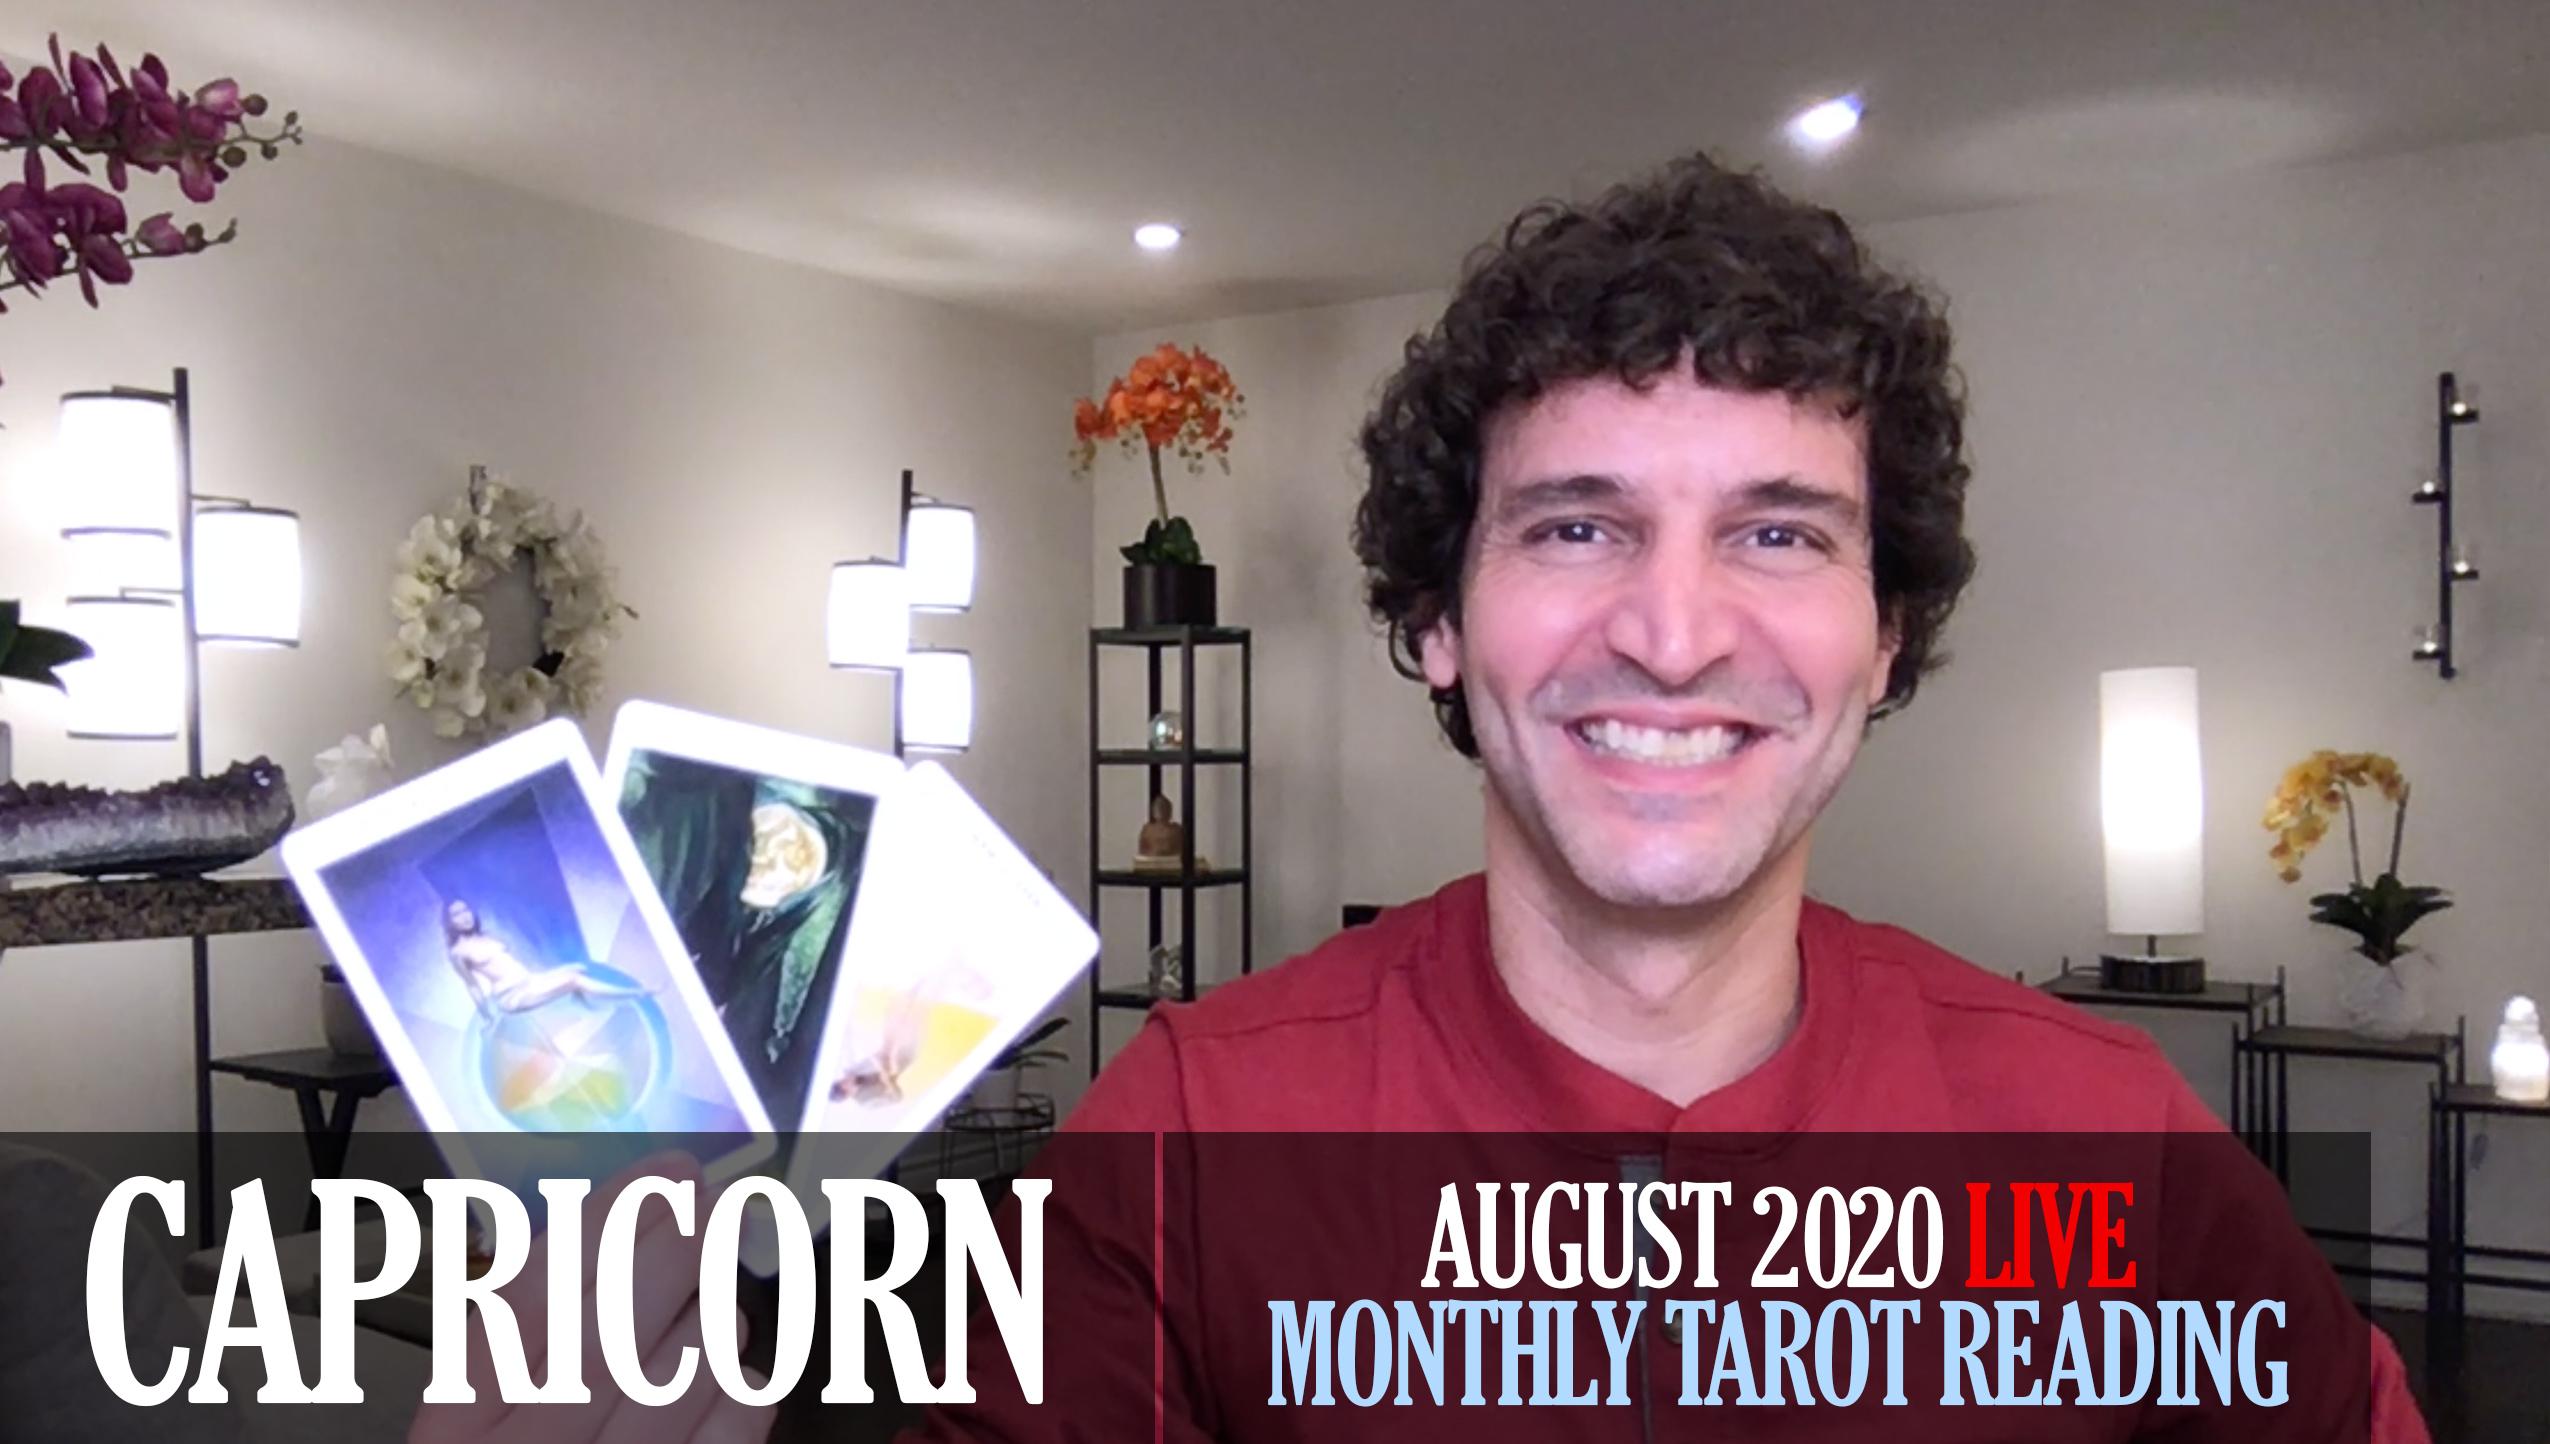 August 2020 CAPRICORN